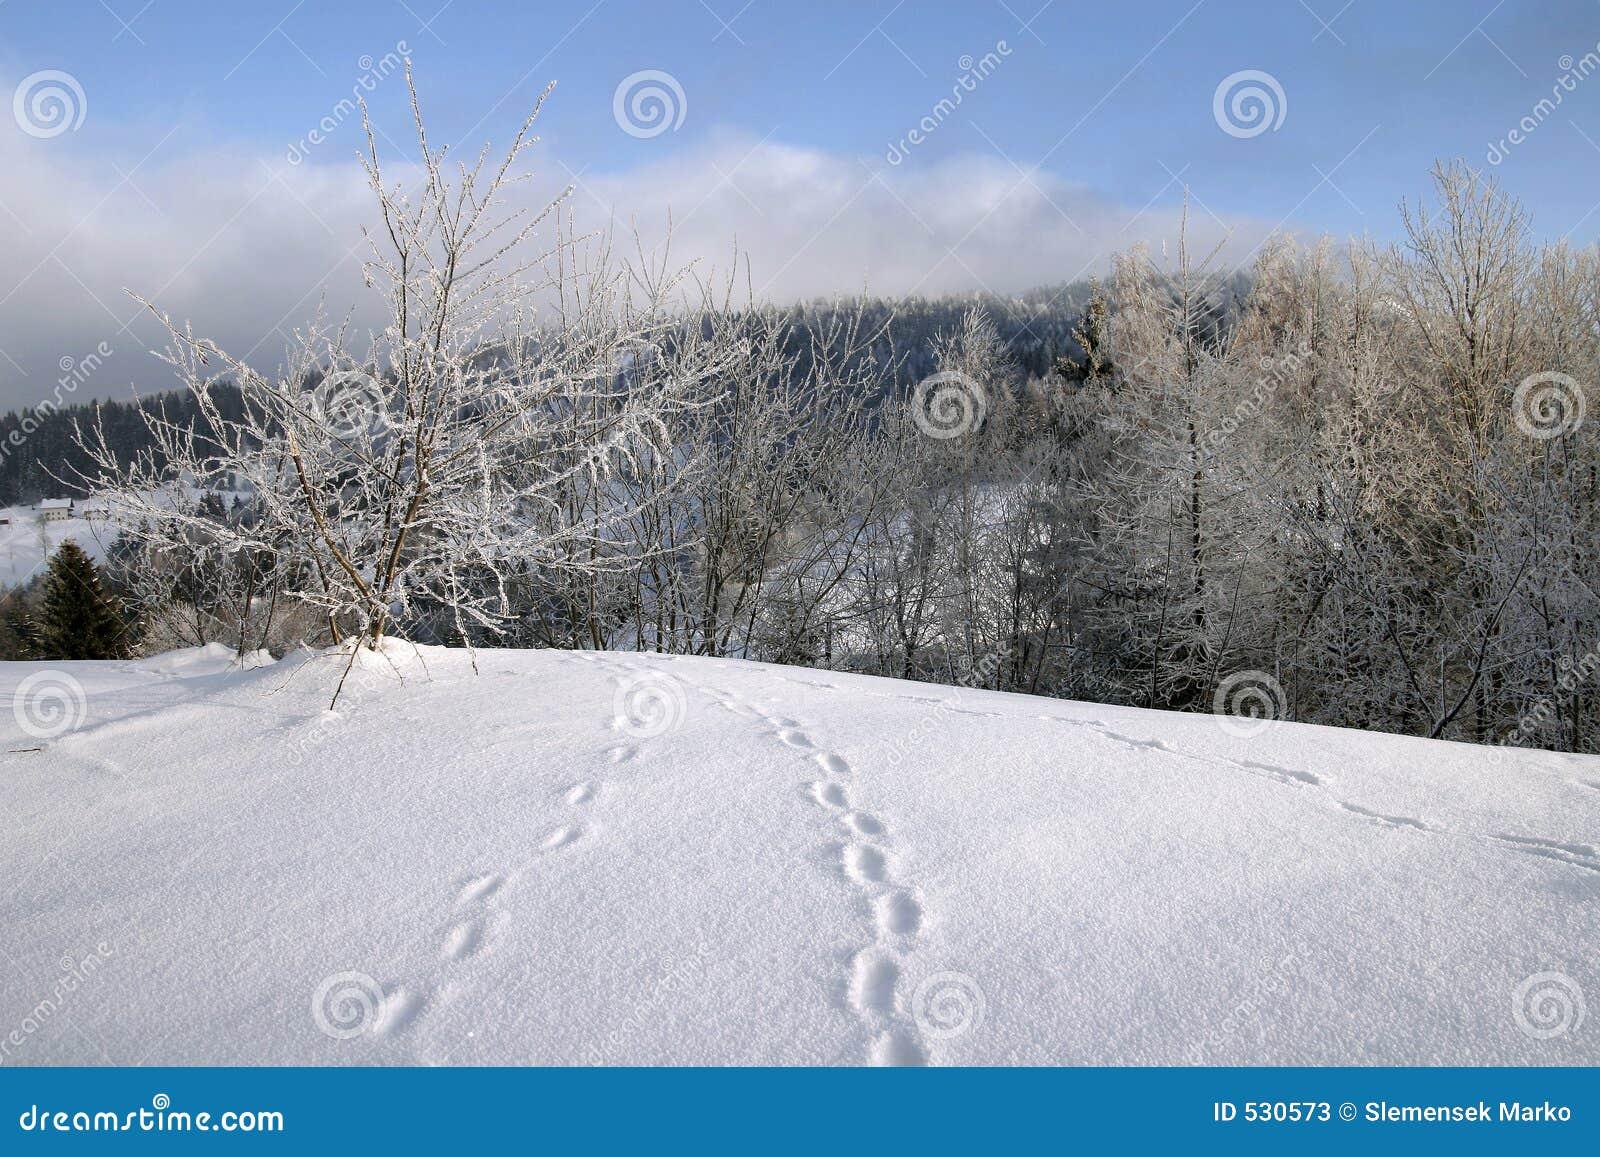 Download 脚步雪 库存图片. 图片 包括有 灌木, 天空, 季节, 国家(地区), 多雪, 空白, 冬天, 工厂, 结构树 - 530573